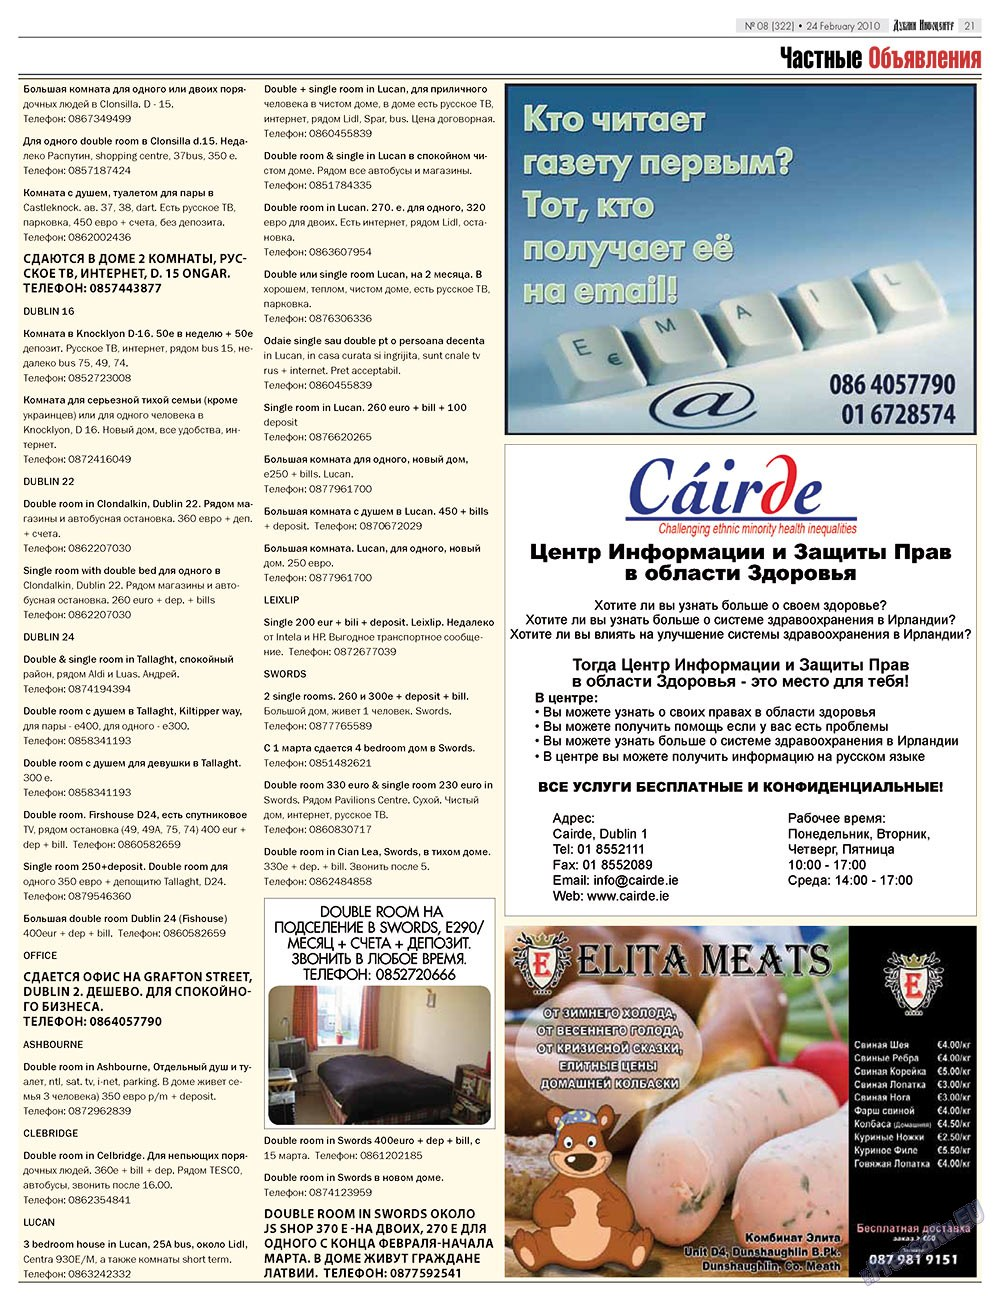 Дублин инфоцентр (газета). 2010 год, номер 8, стр. 21